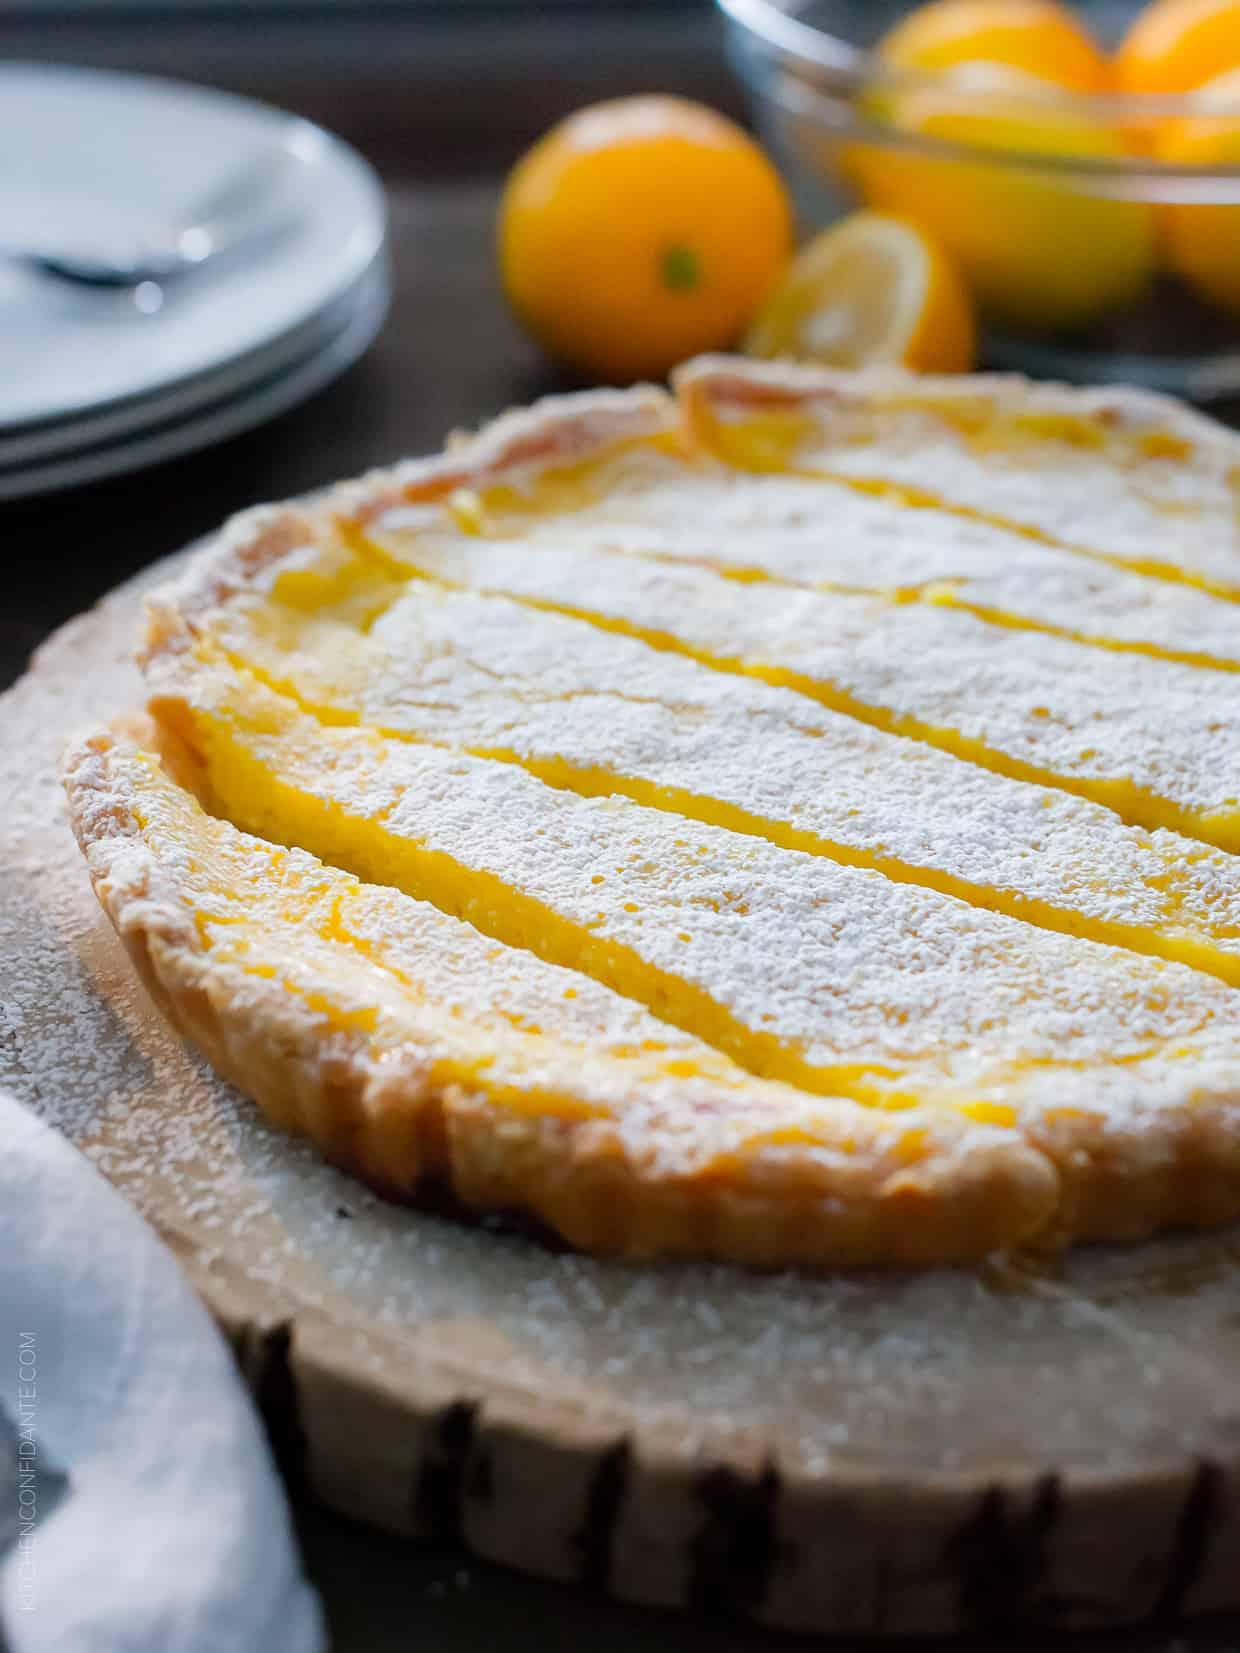 A Meyer Lemon Tart sliced on a serving platter.